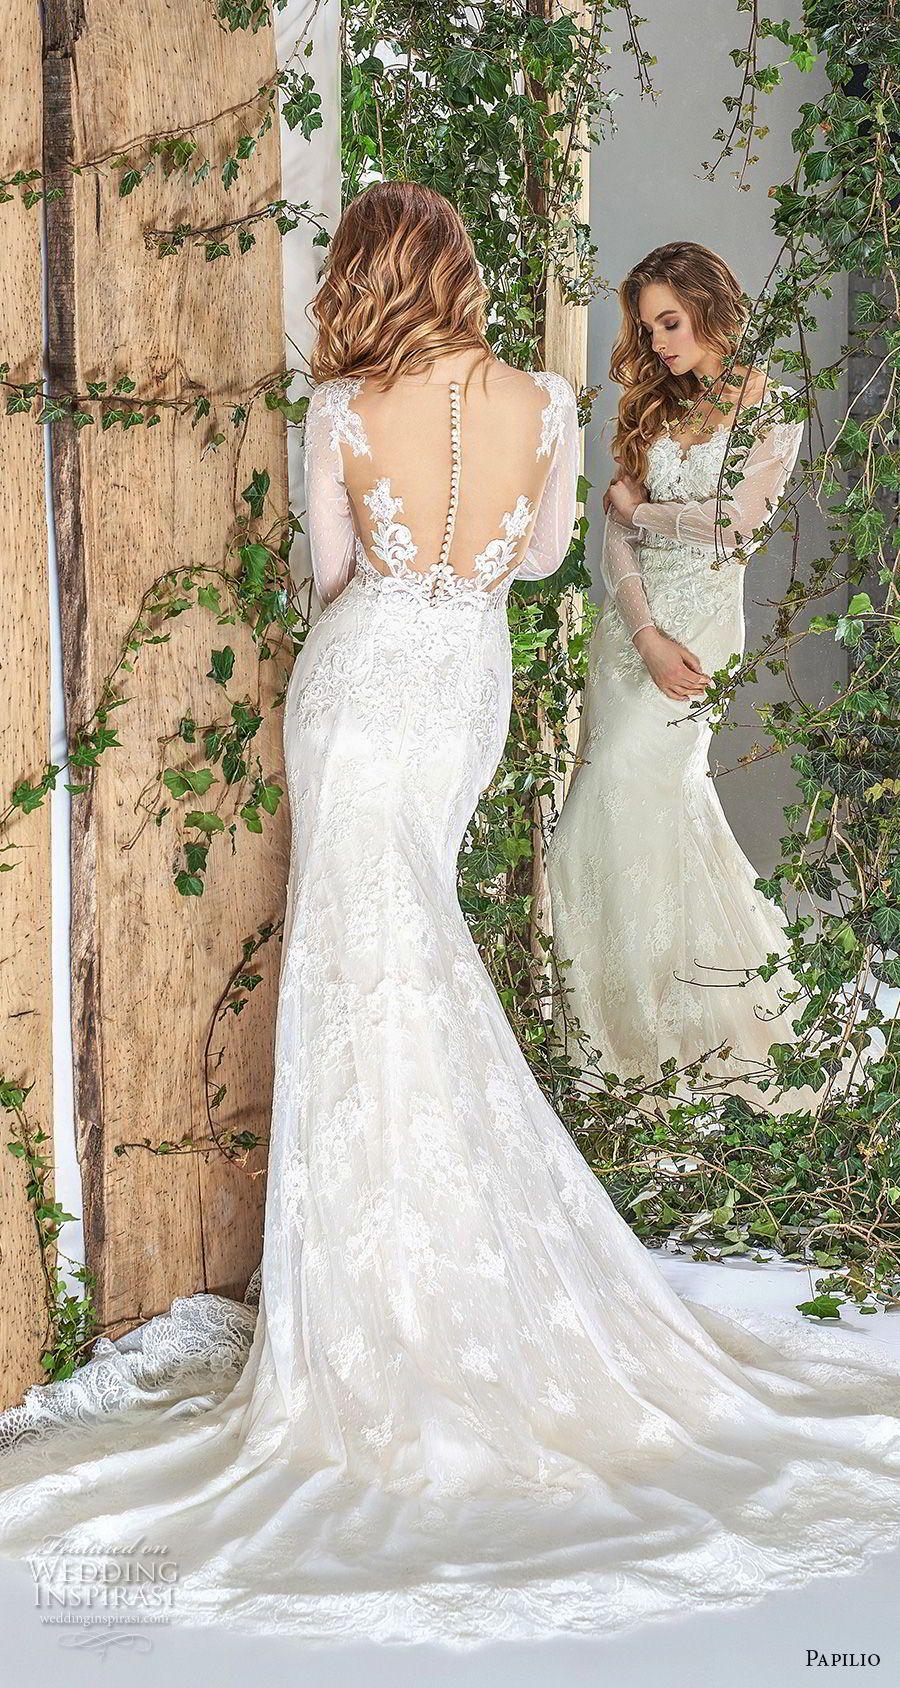 Sheer long sleeve wedding dresses  Papilio  Wedding Dresses u ucWonderlandud Bridal Collection